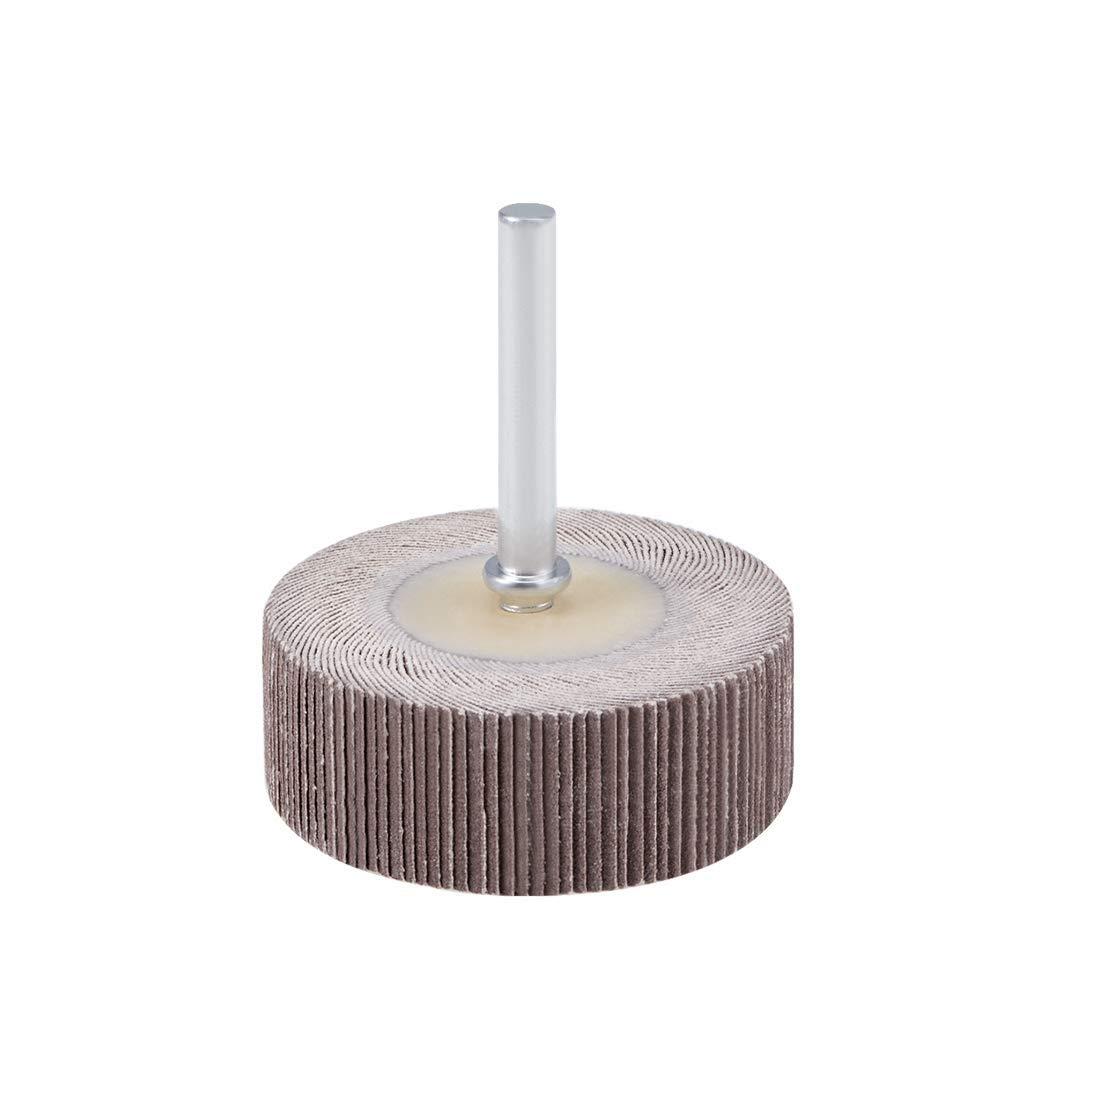 Flap Wheel 50mm x 20mm 240 Abrasive Grain grit with 1//4axle